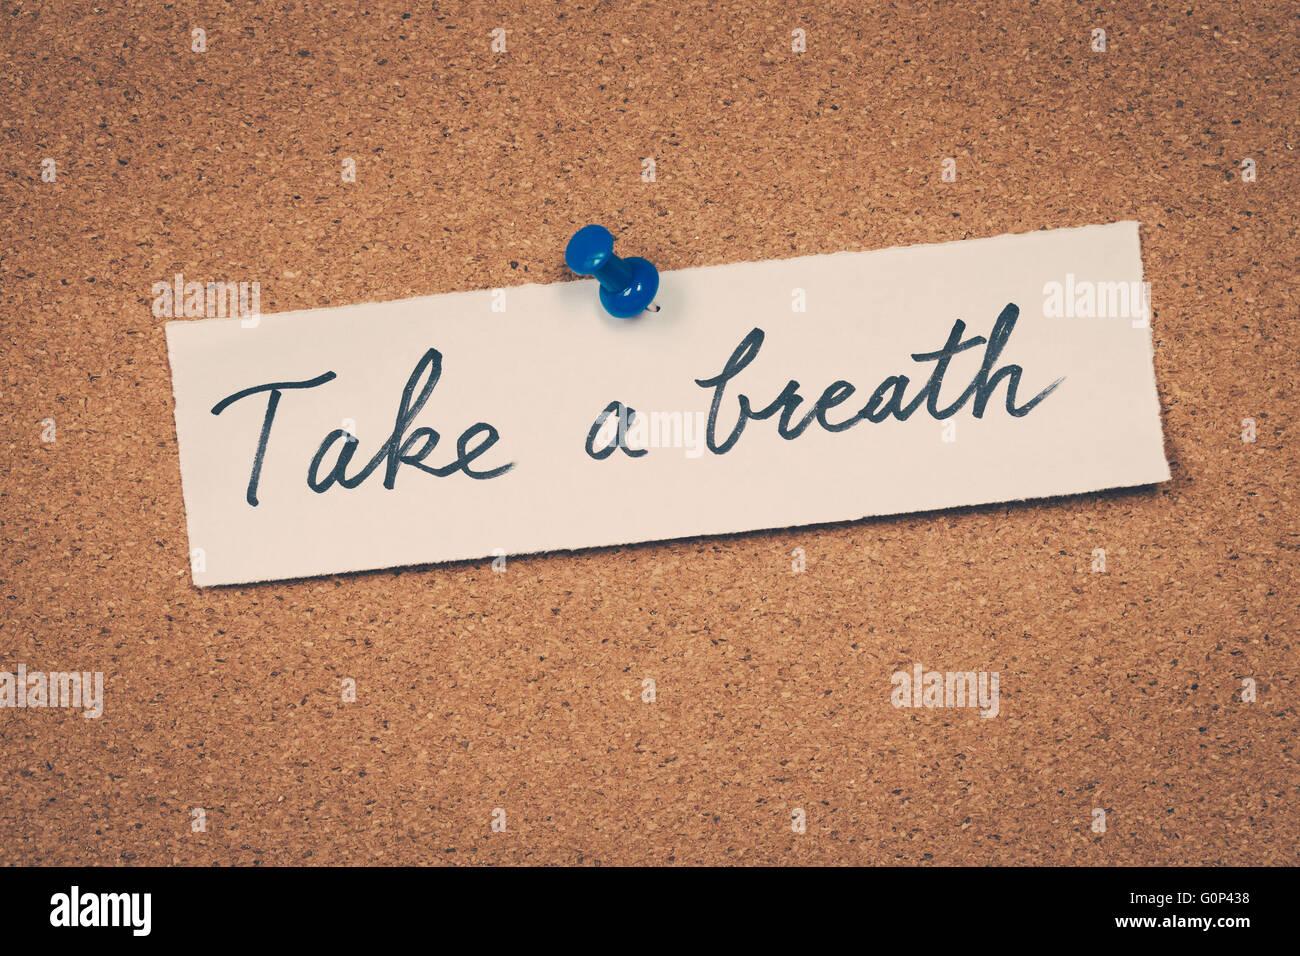 Take a breath - Stock Image